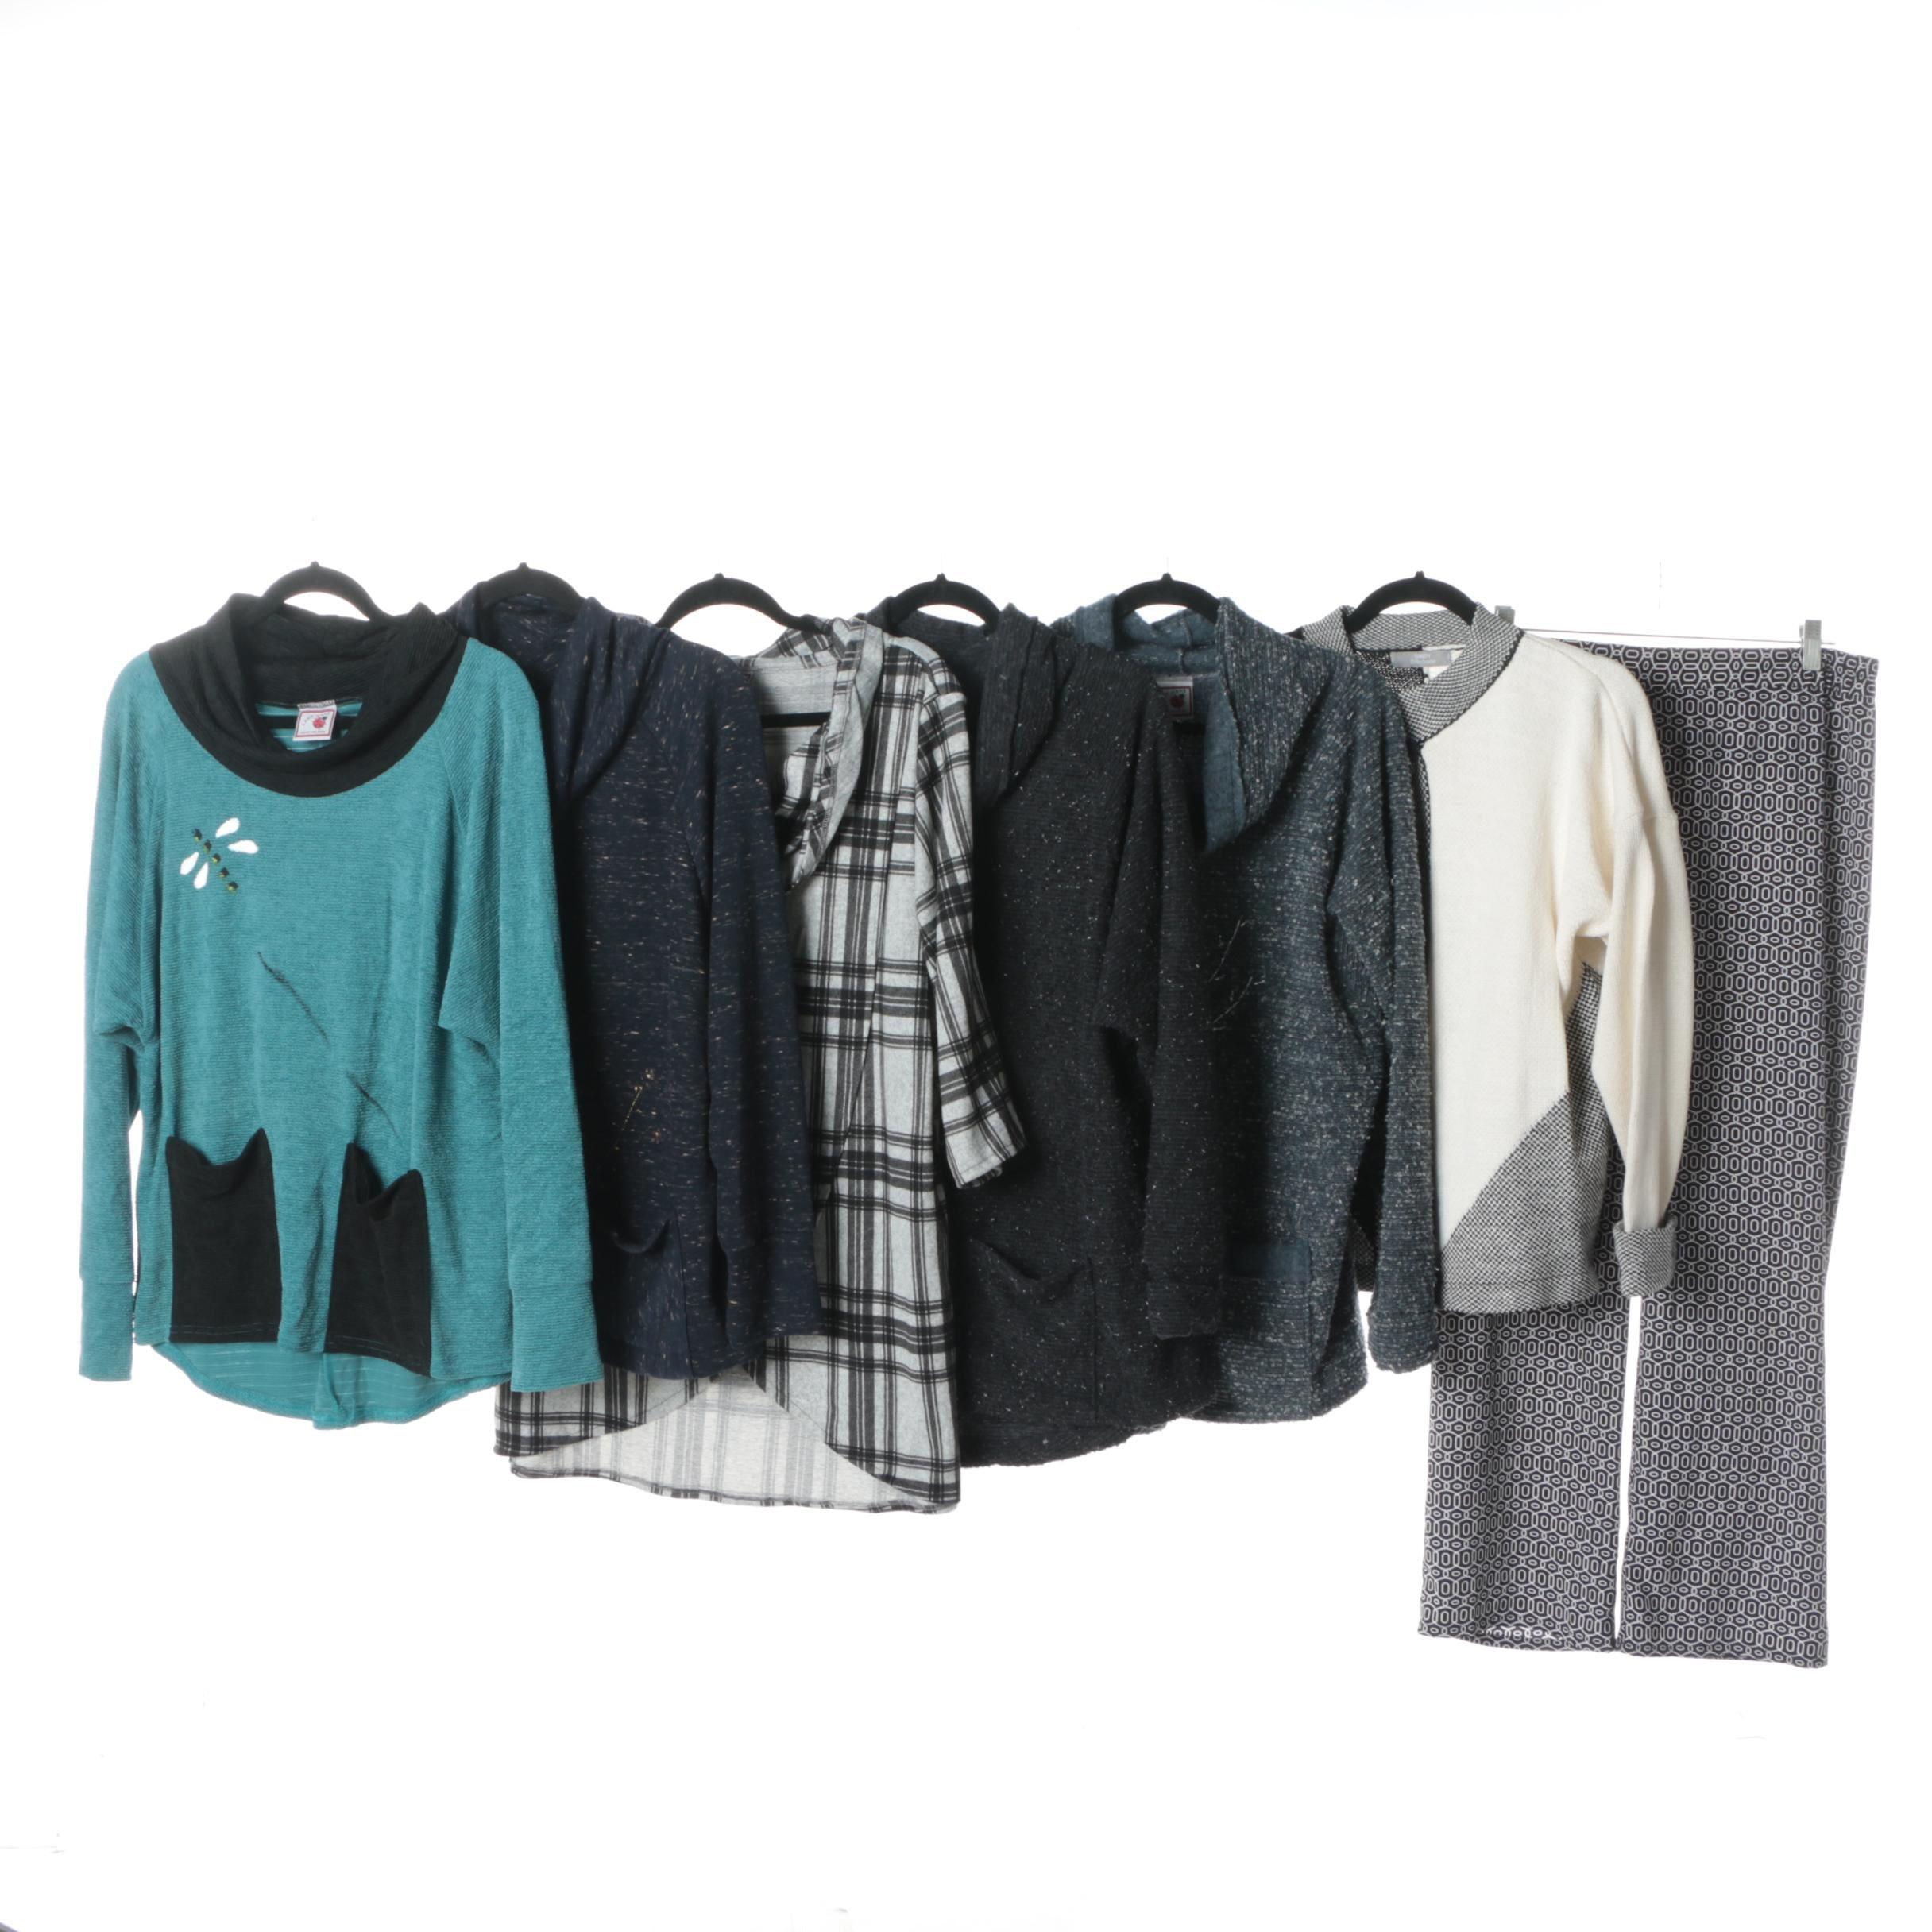 Women's Clothing Separates Including Lady Jane